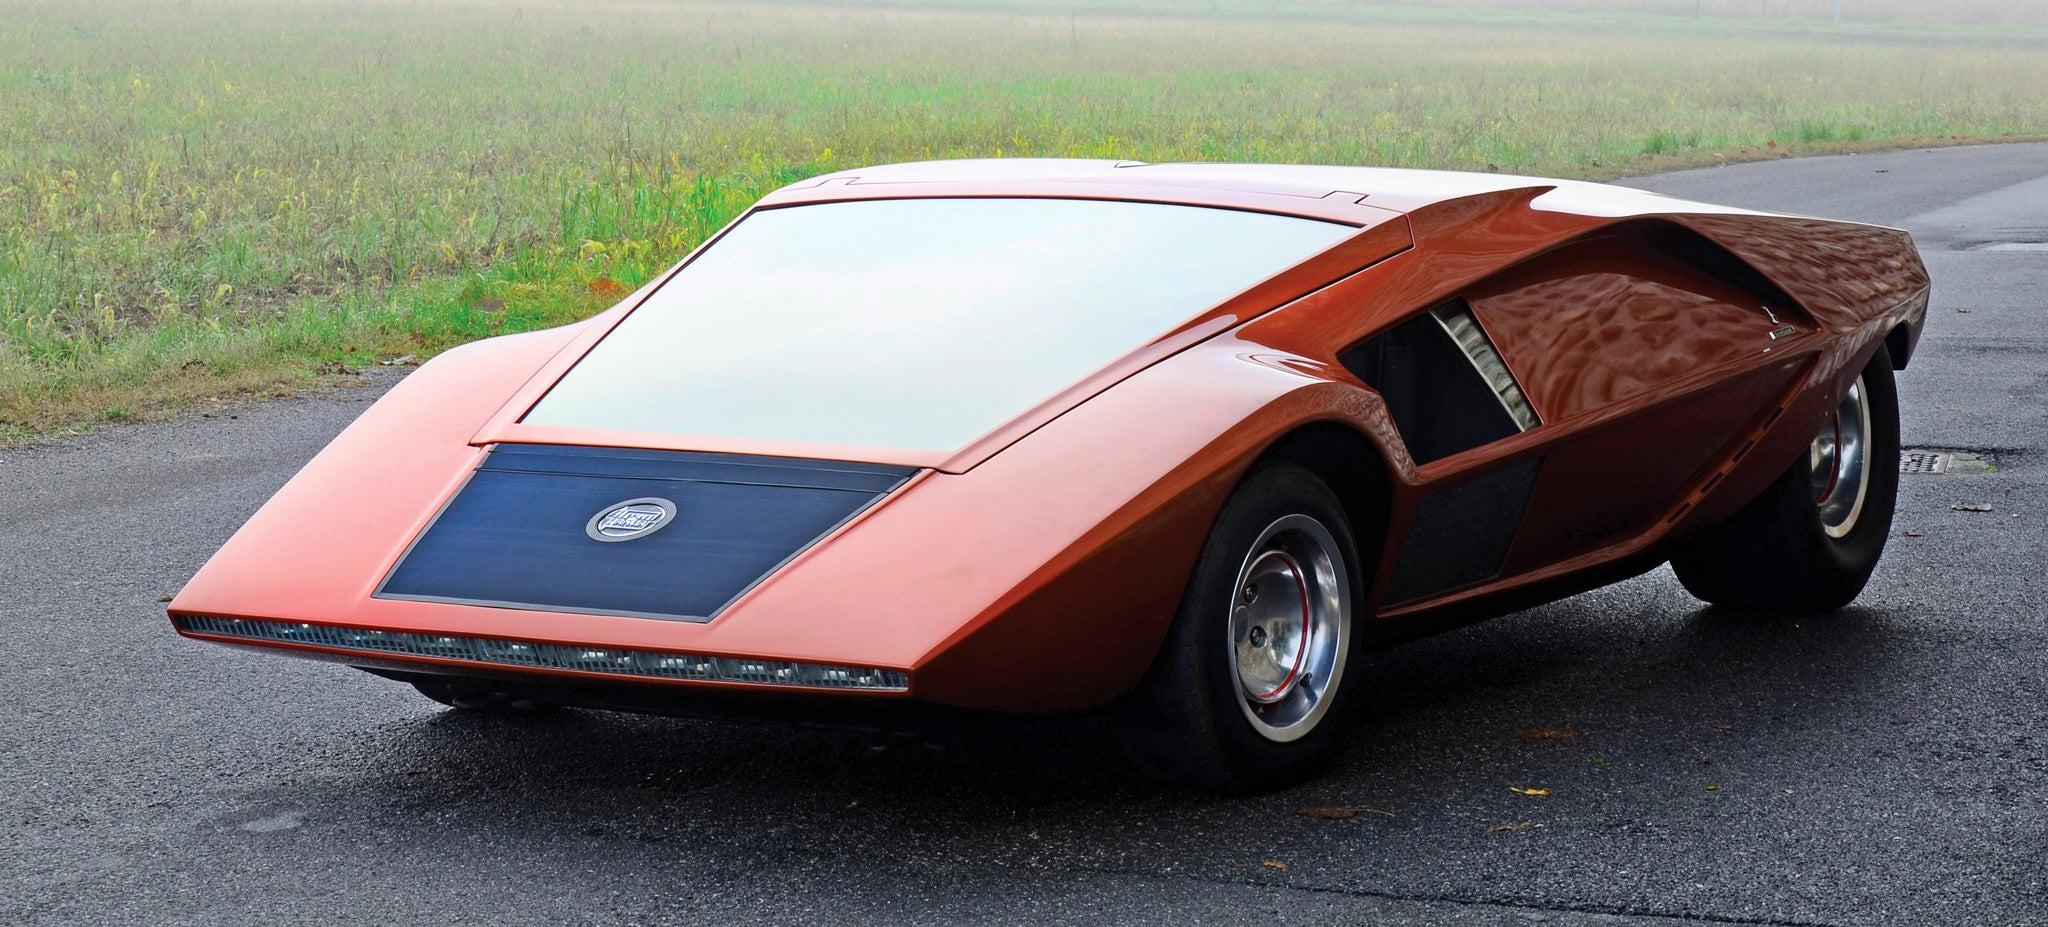 The Bertone Lancia Stratos Hf Zero Was The Baddest Disco